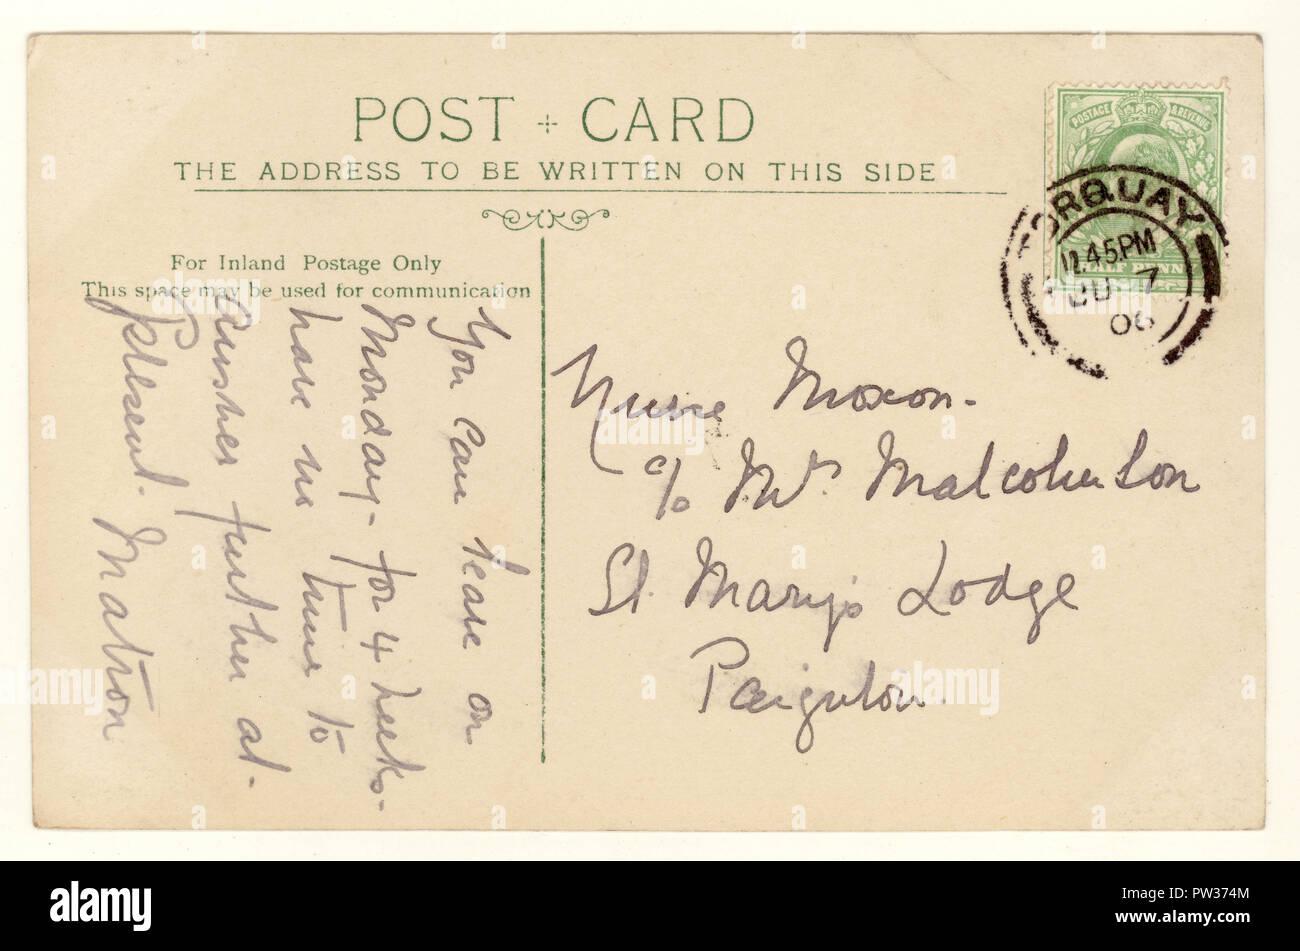 Reverse of Edwardian postcard, postmarked Torquay, Devon, U.K. posted June 7 1906 - Stock Image